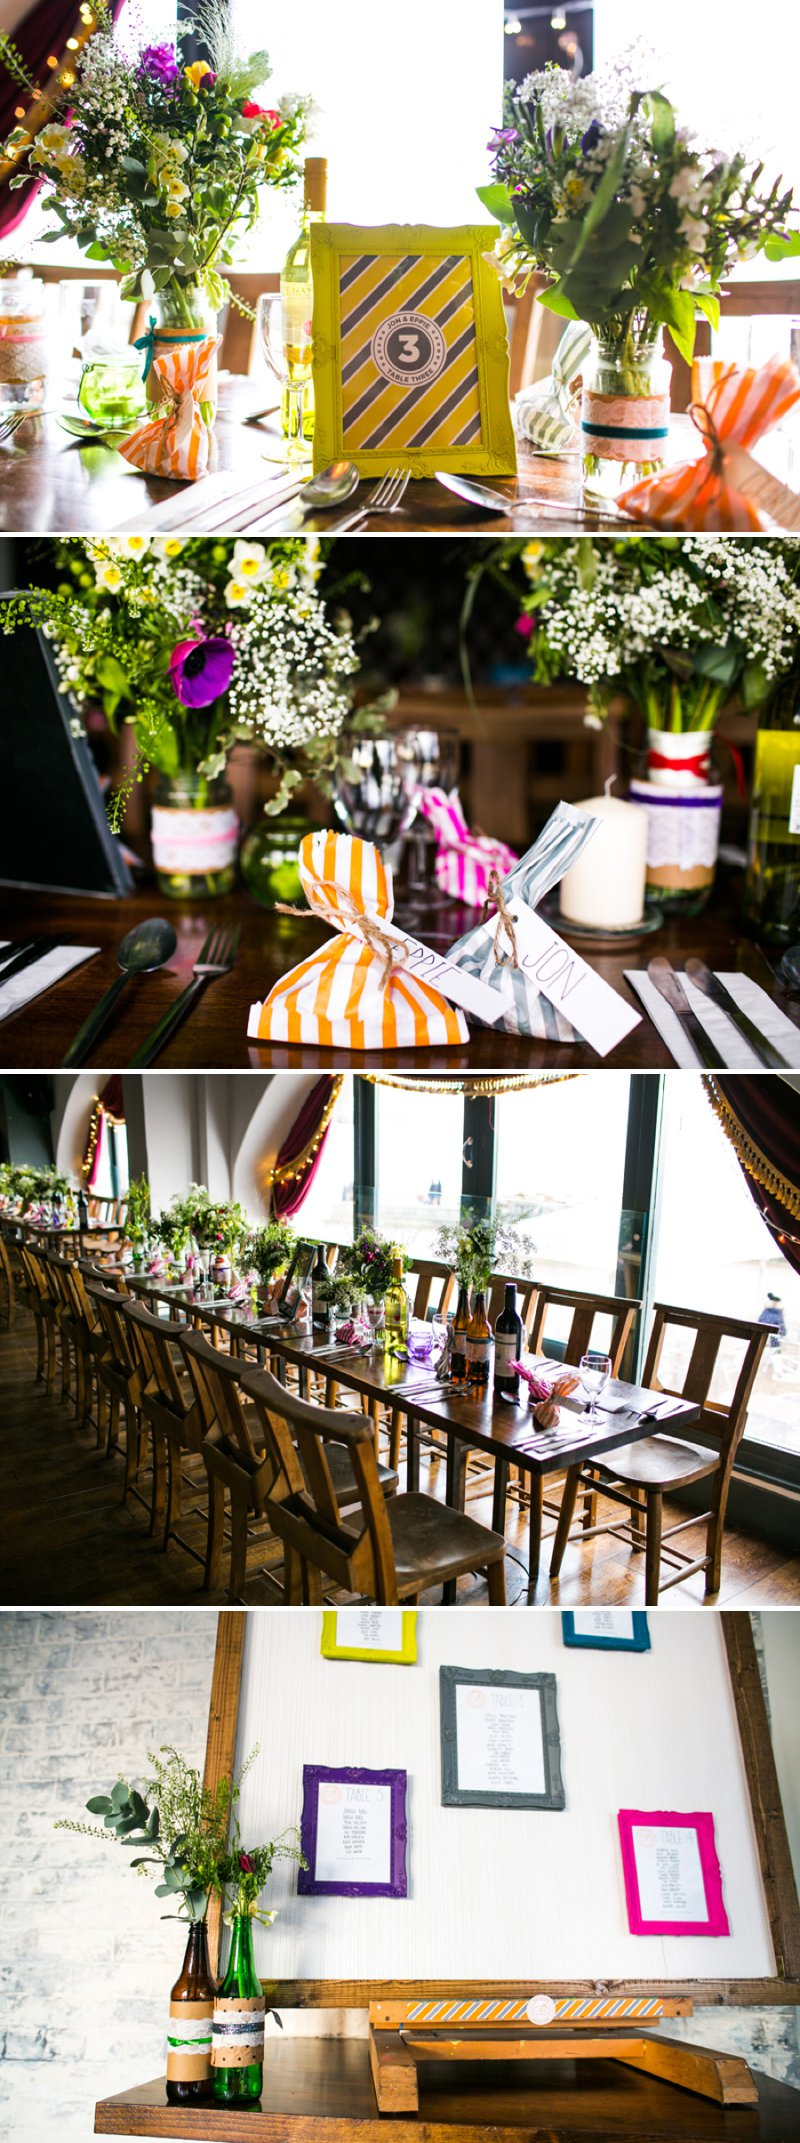 Colour Pop Wedding Decor Stripes Table Settings